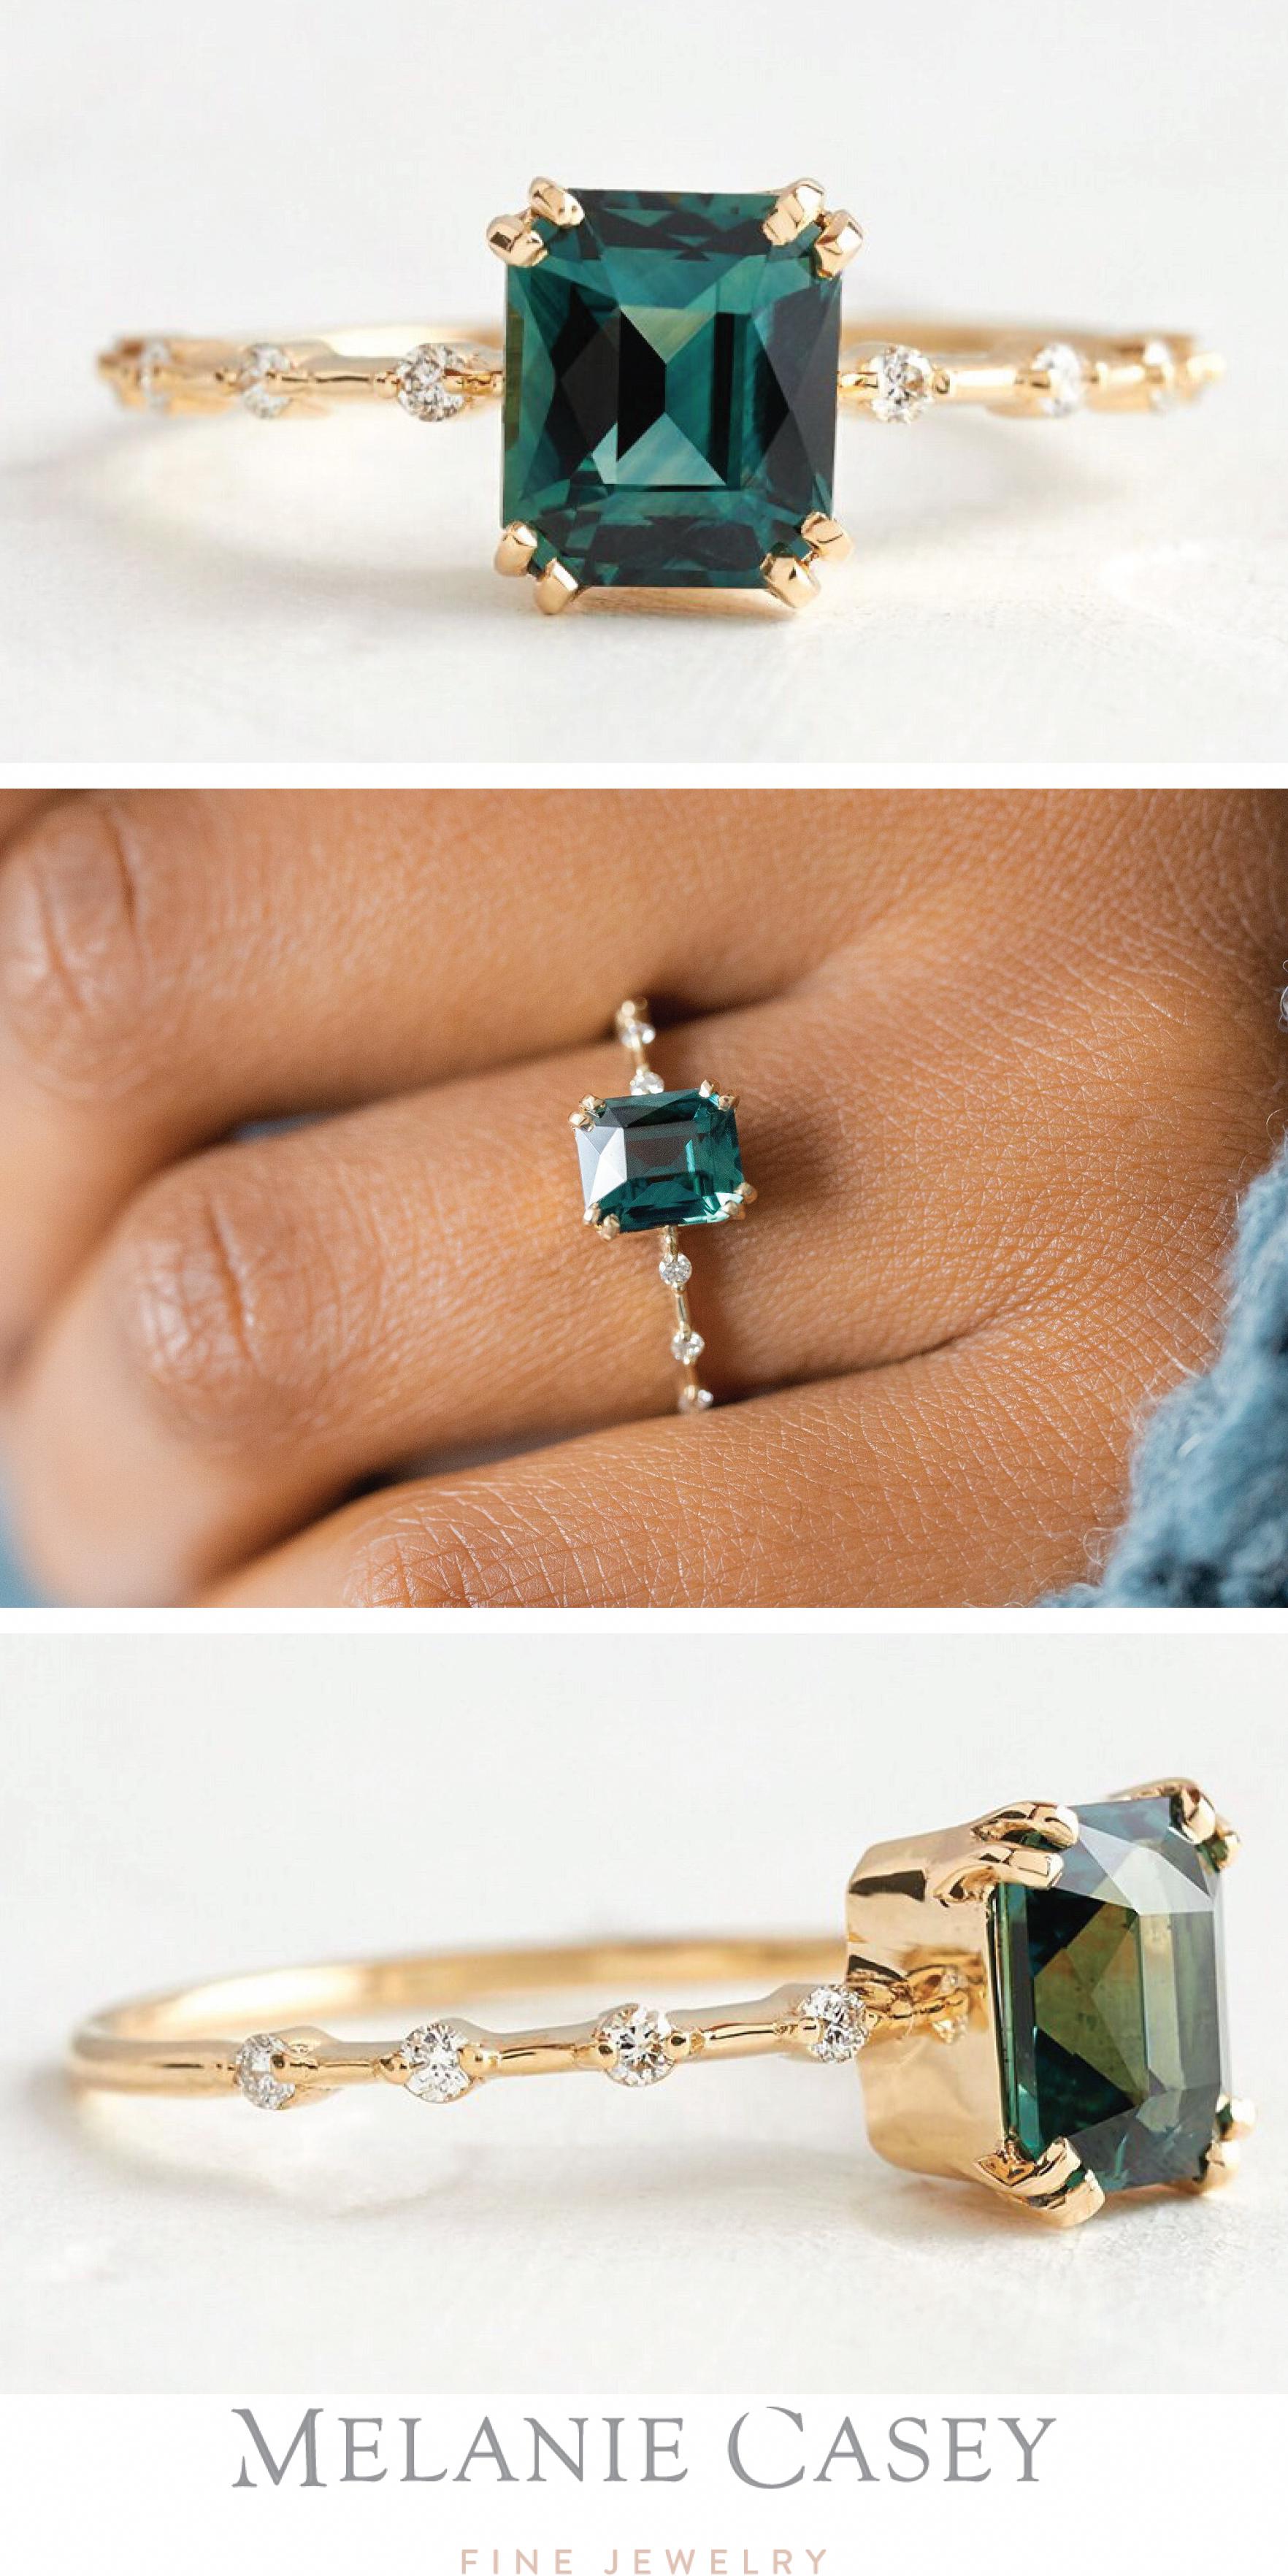 Jewelry Big Necklace Earrings Men Wedding Rings Opal Pure Gold Rings Custom Diamond Ring Gruner Saphir Verlobungsring Ring Verlobung Silberohrringe